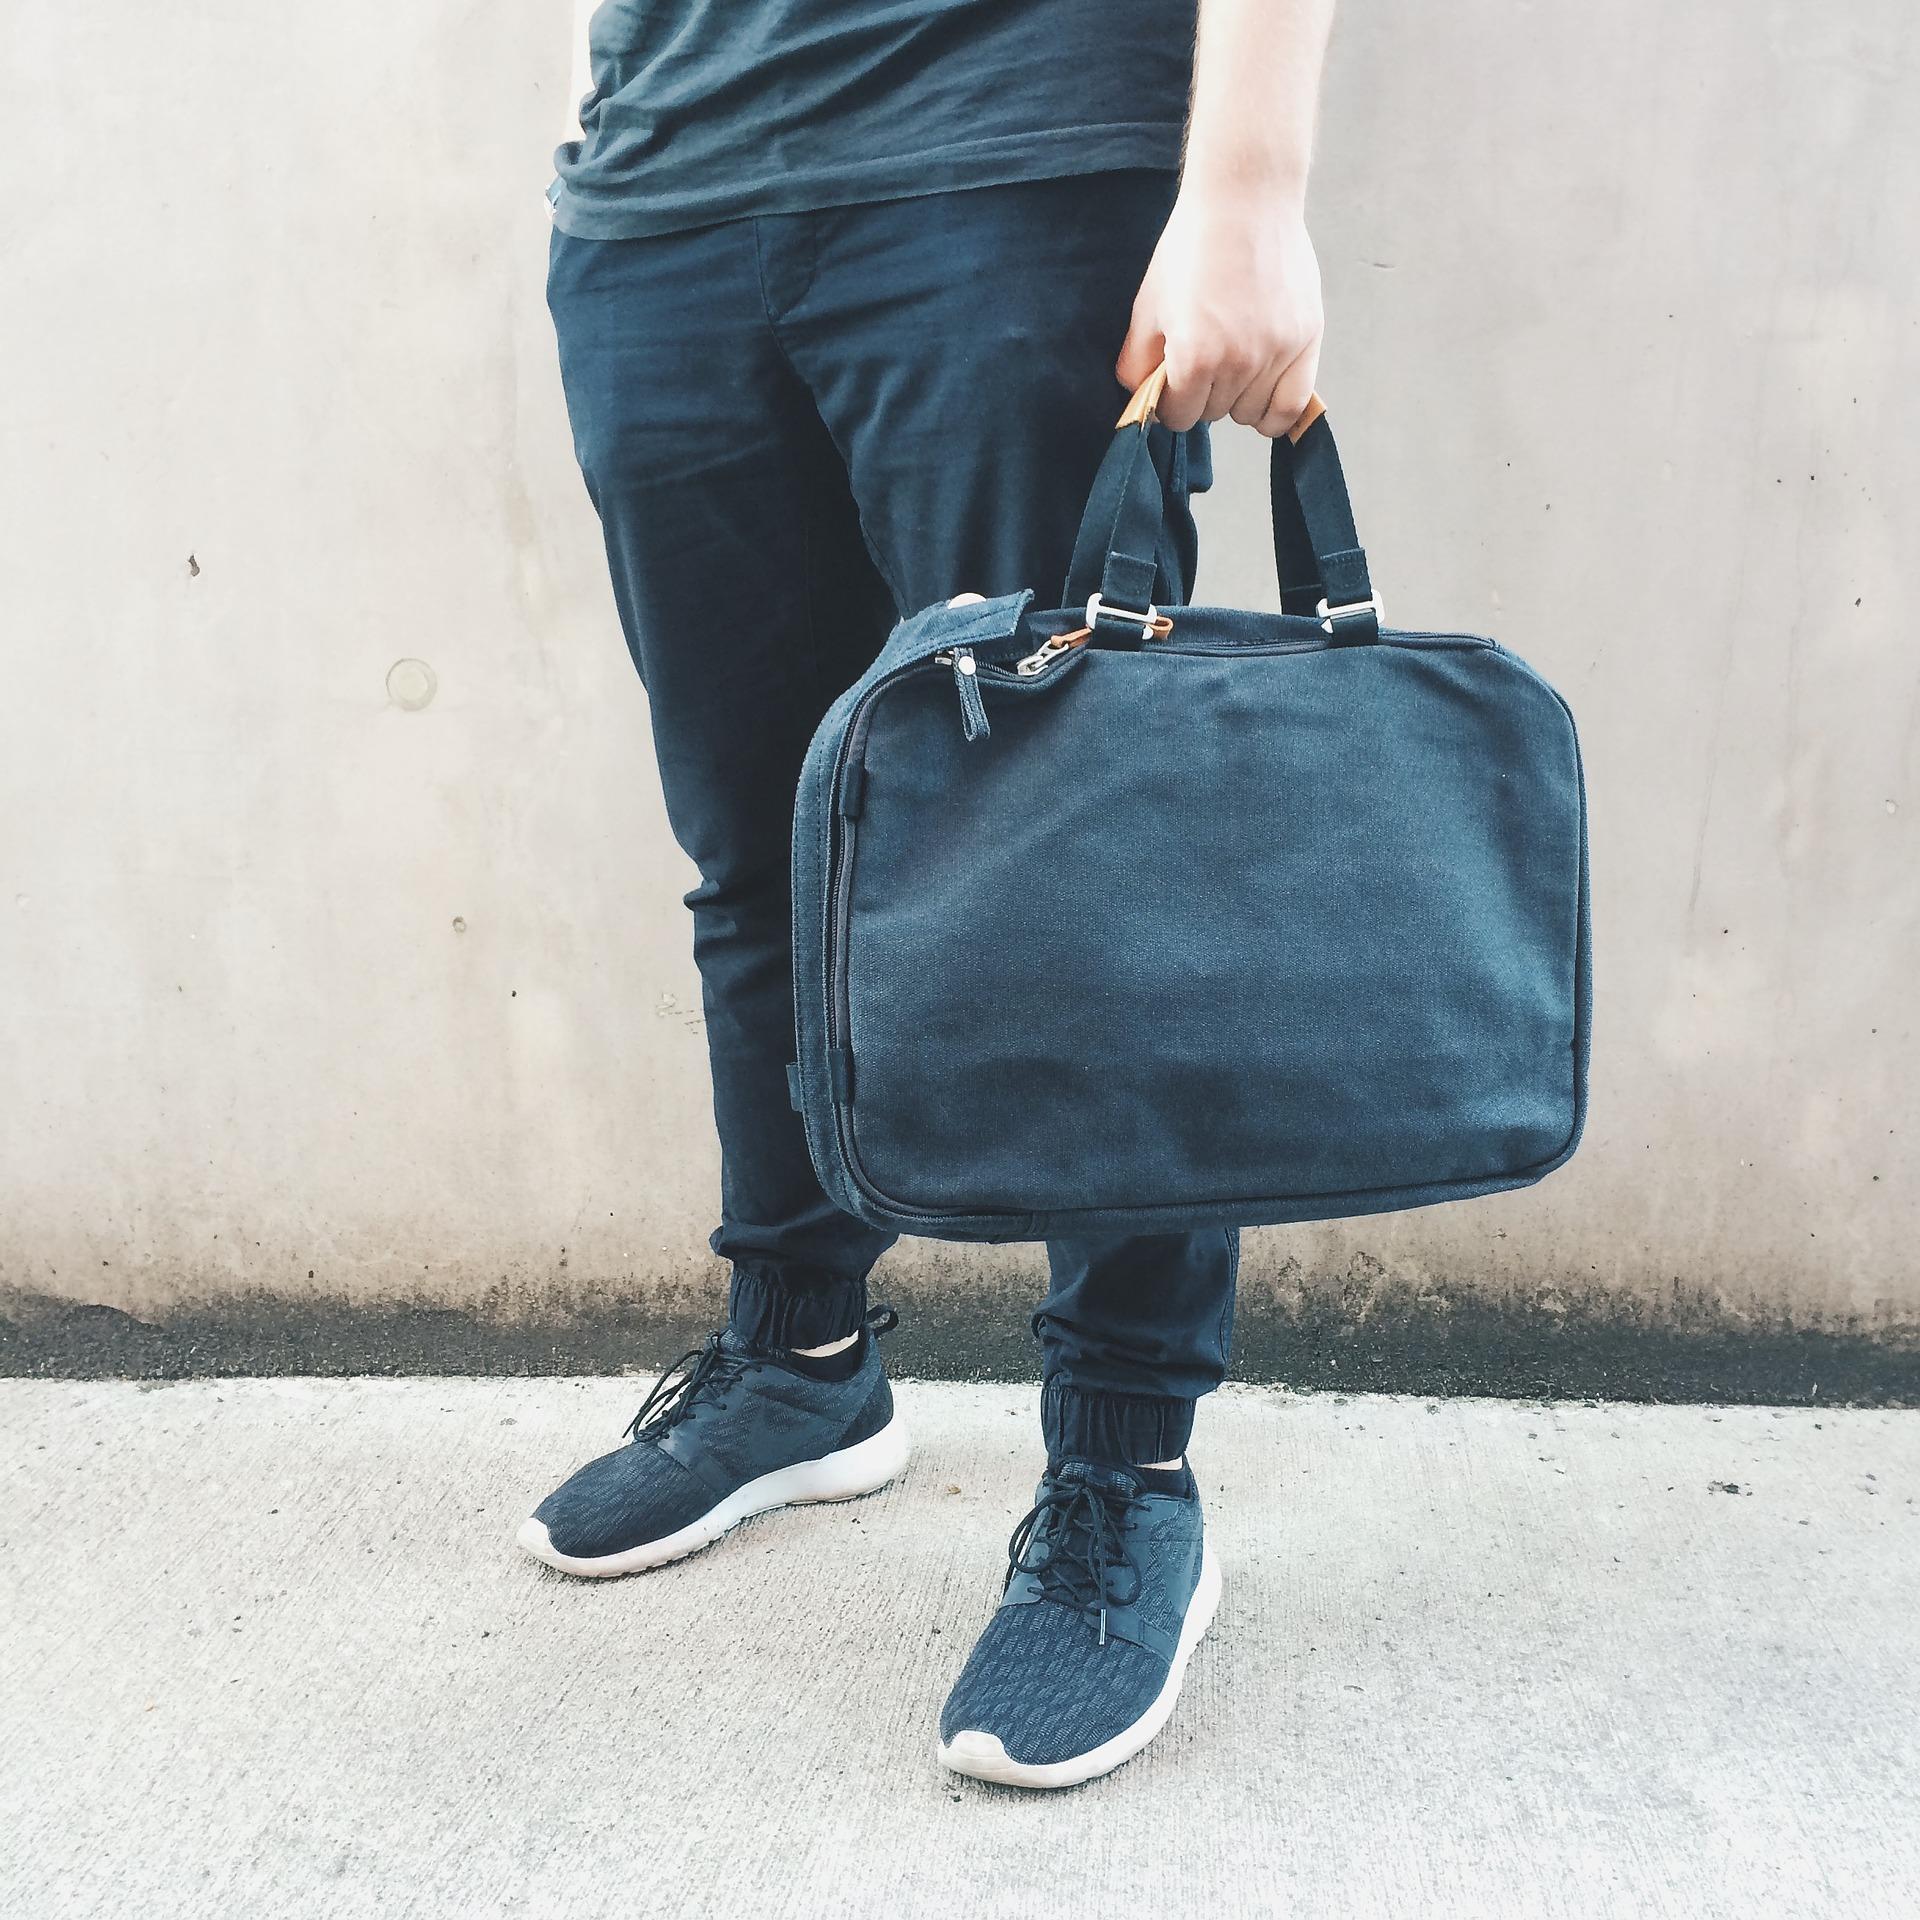 bag-1844806_1920